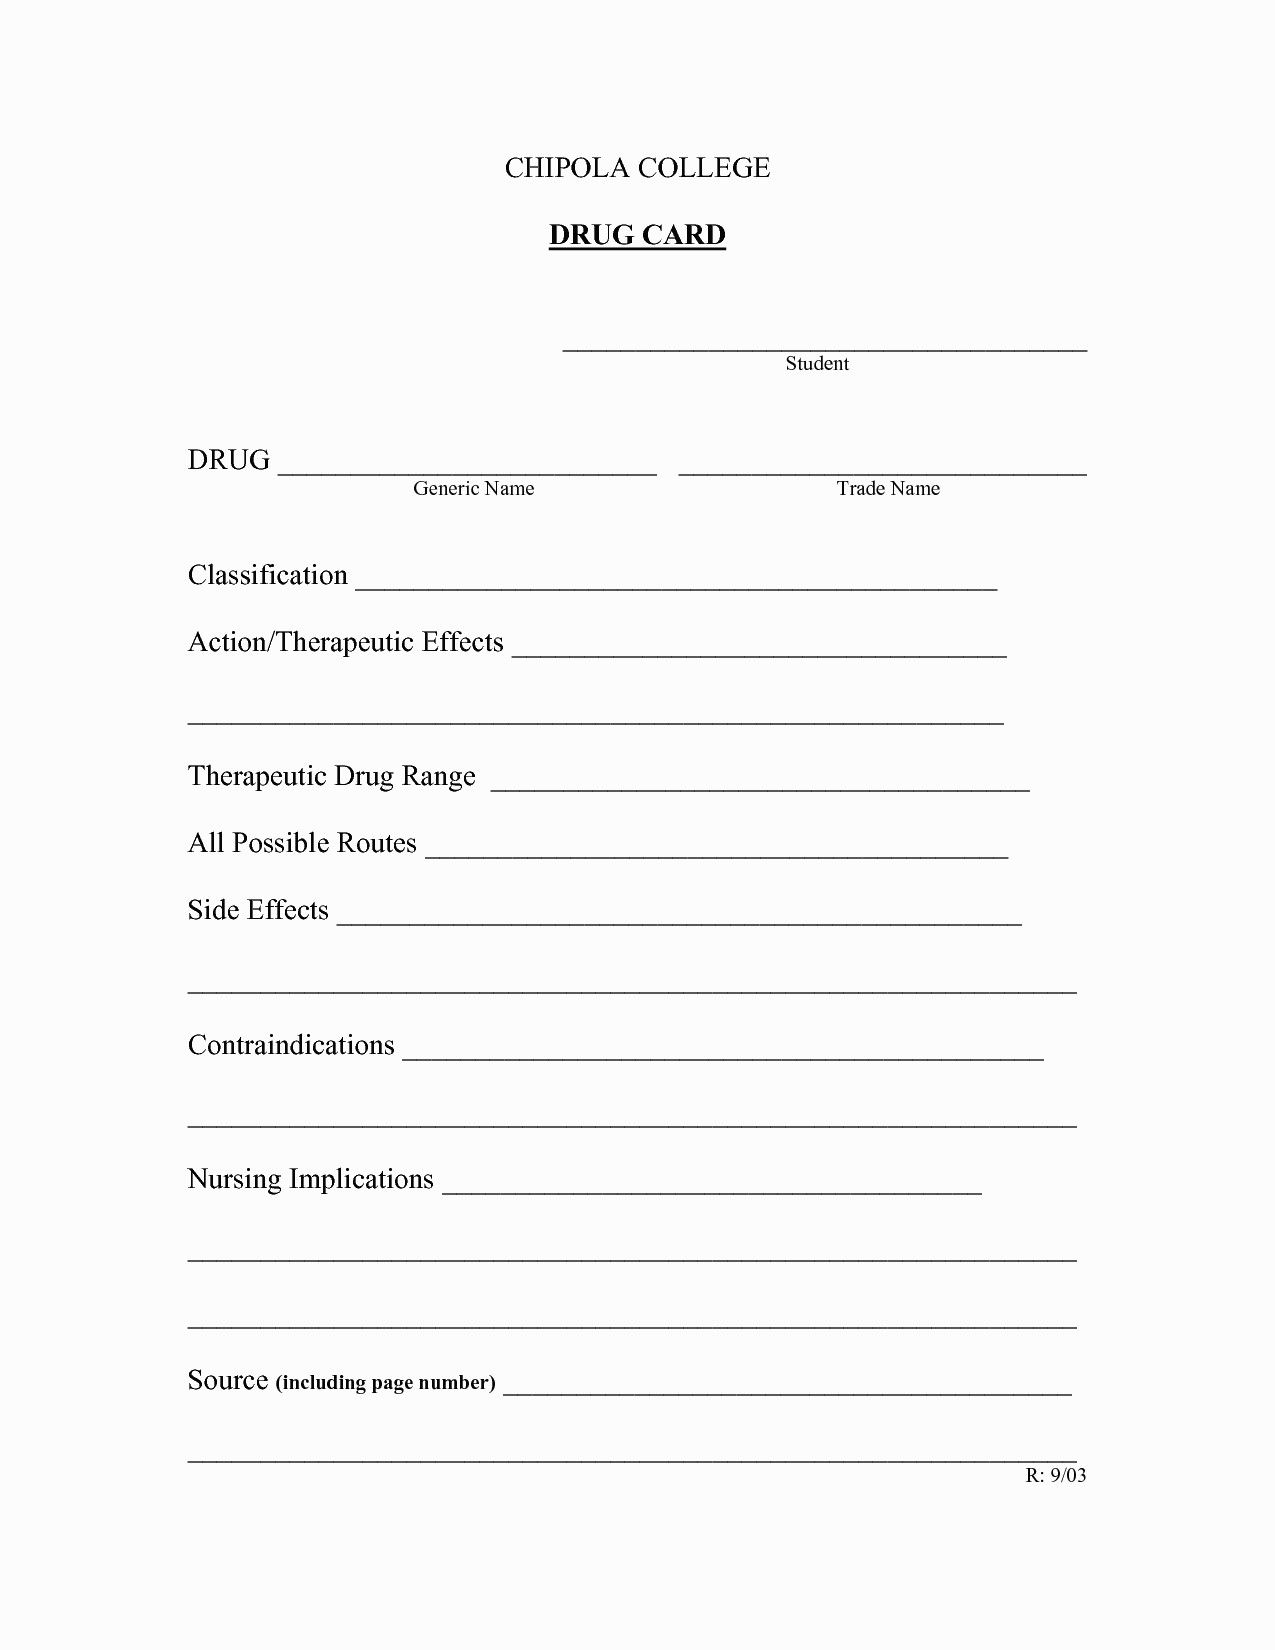 Medication Card Template Wallet For Nursing Students Drug Pertaining To Medication Card Template Cumed Org Drug Cards Nursing Students Pharmacology